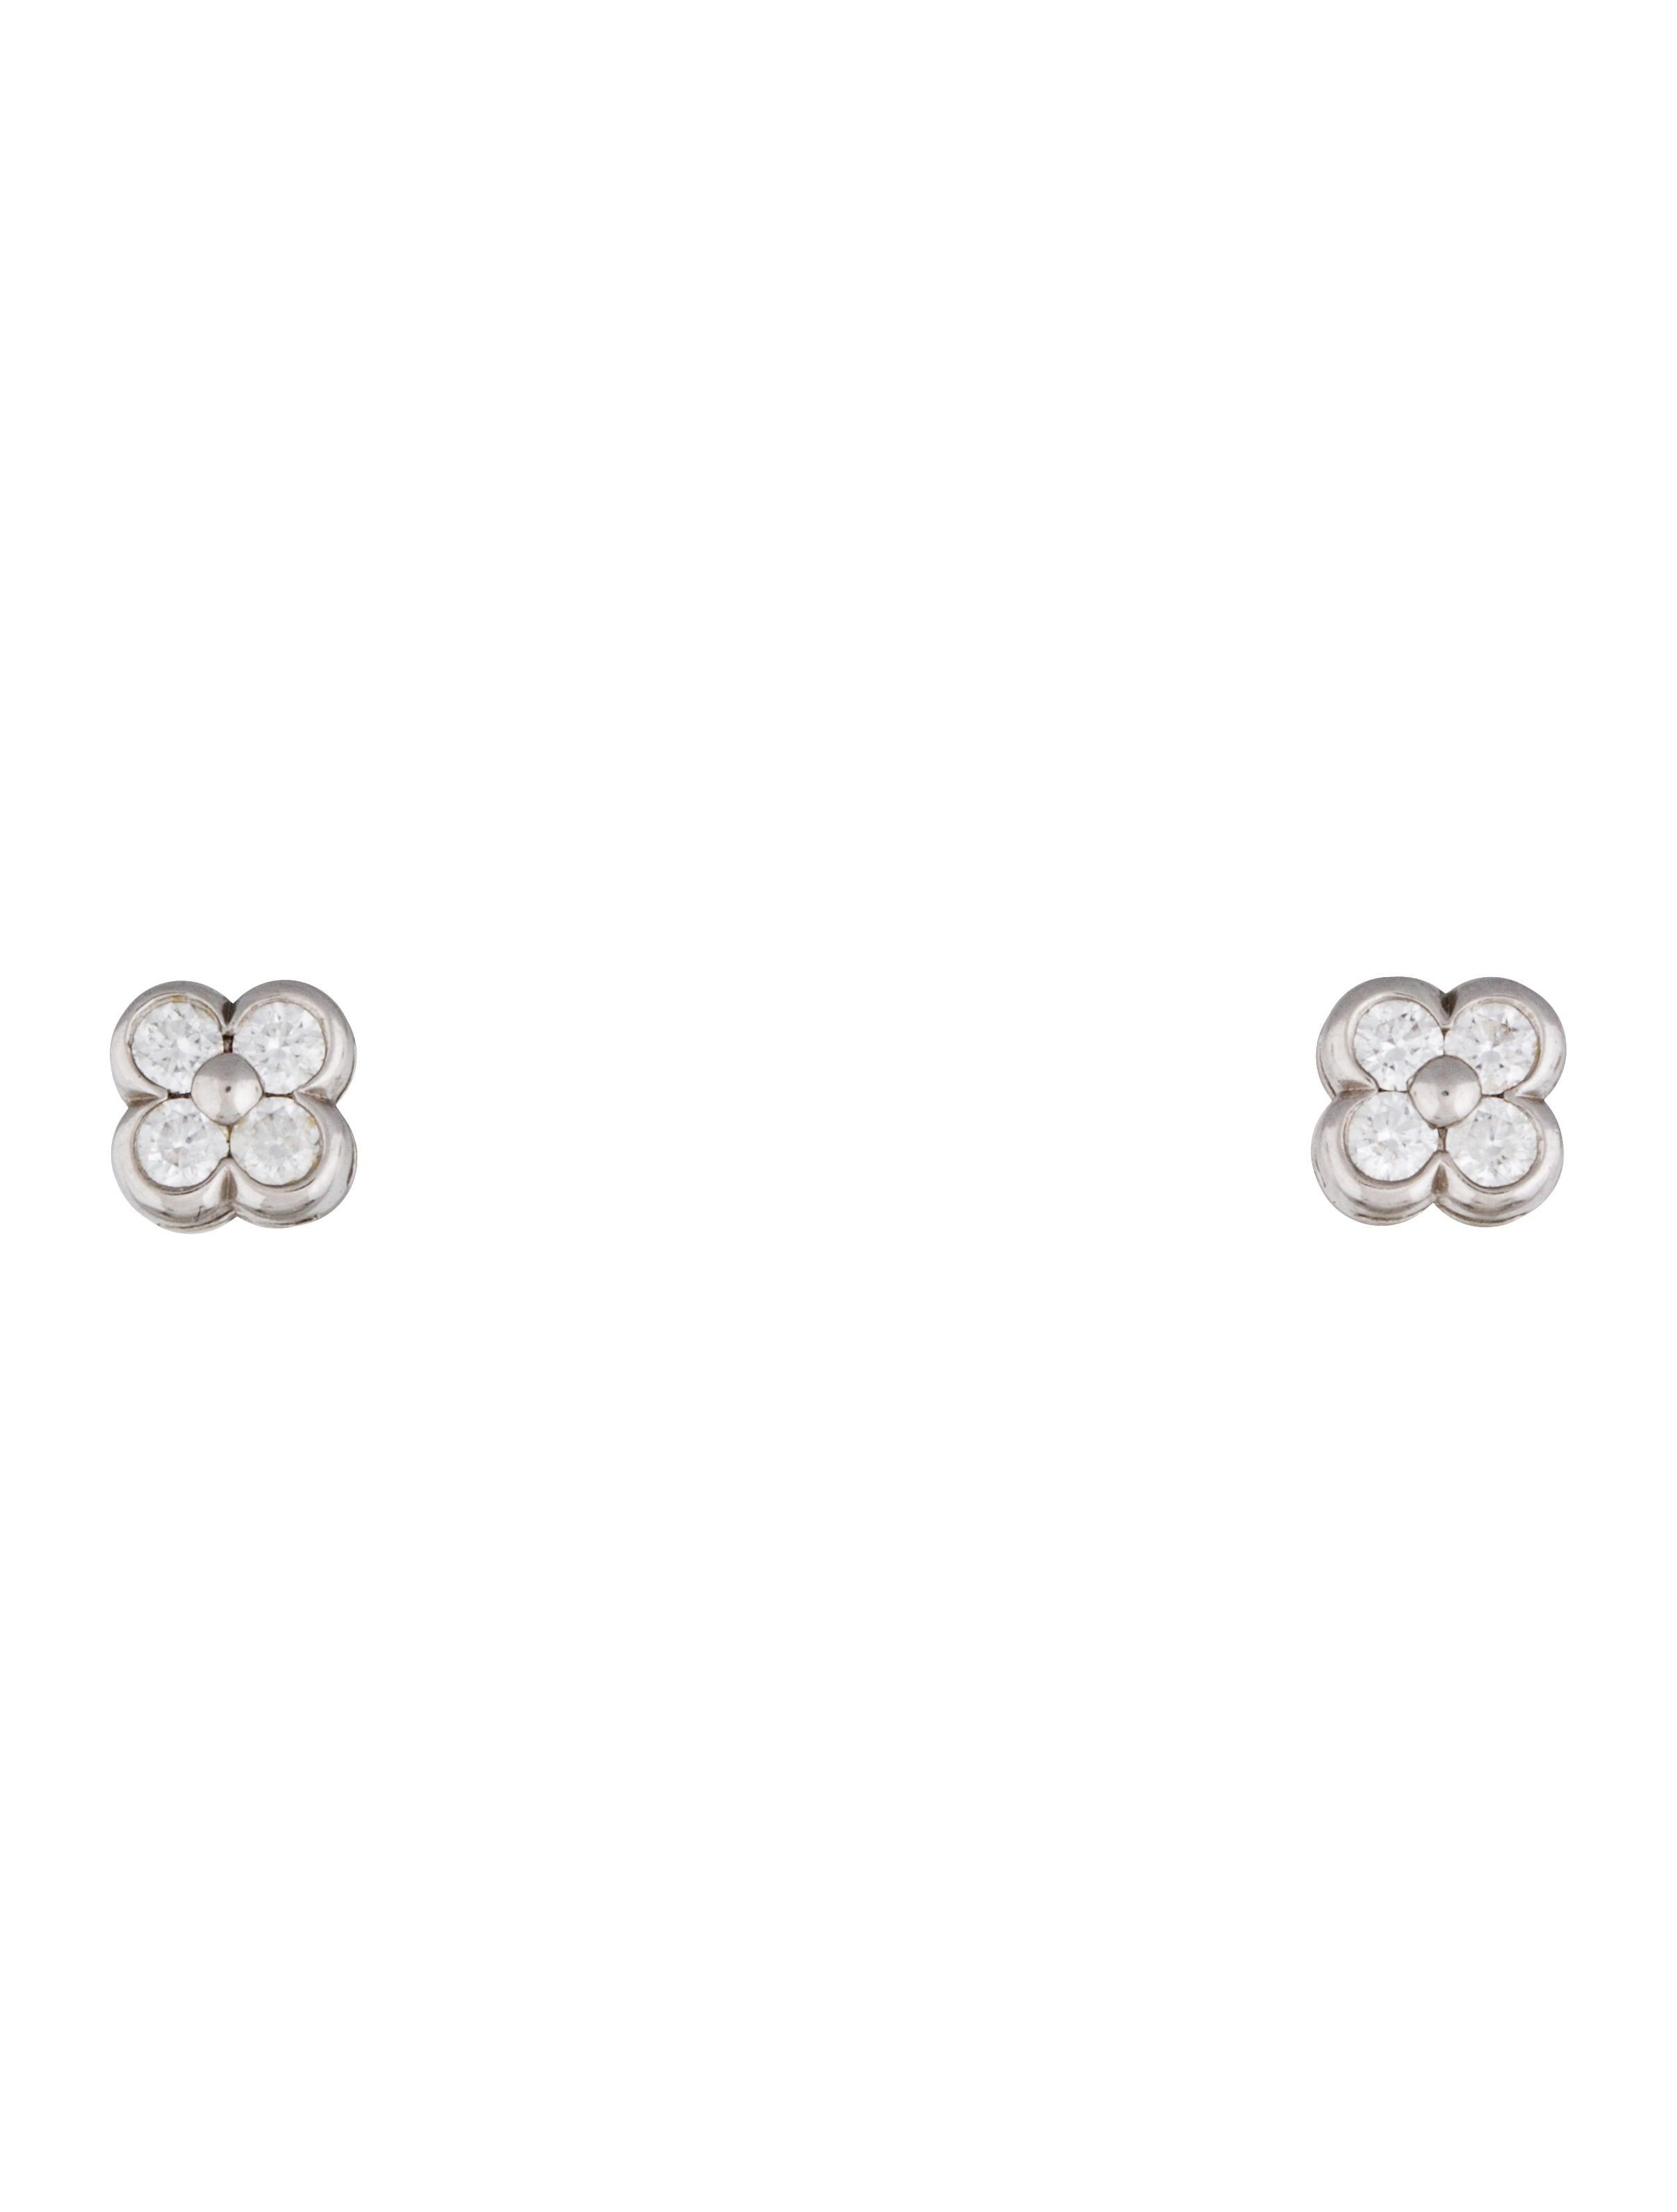 Tiffany & Co Platinum Four Diamond Cluster Earrings Earrings